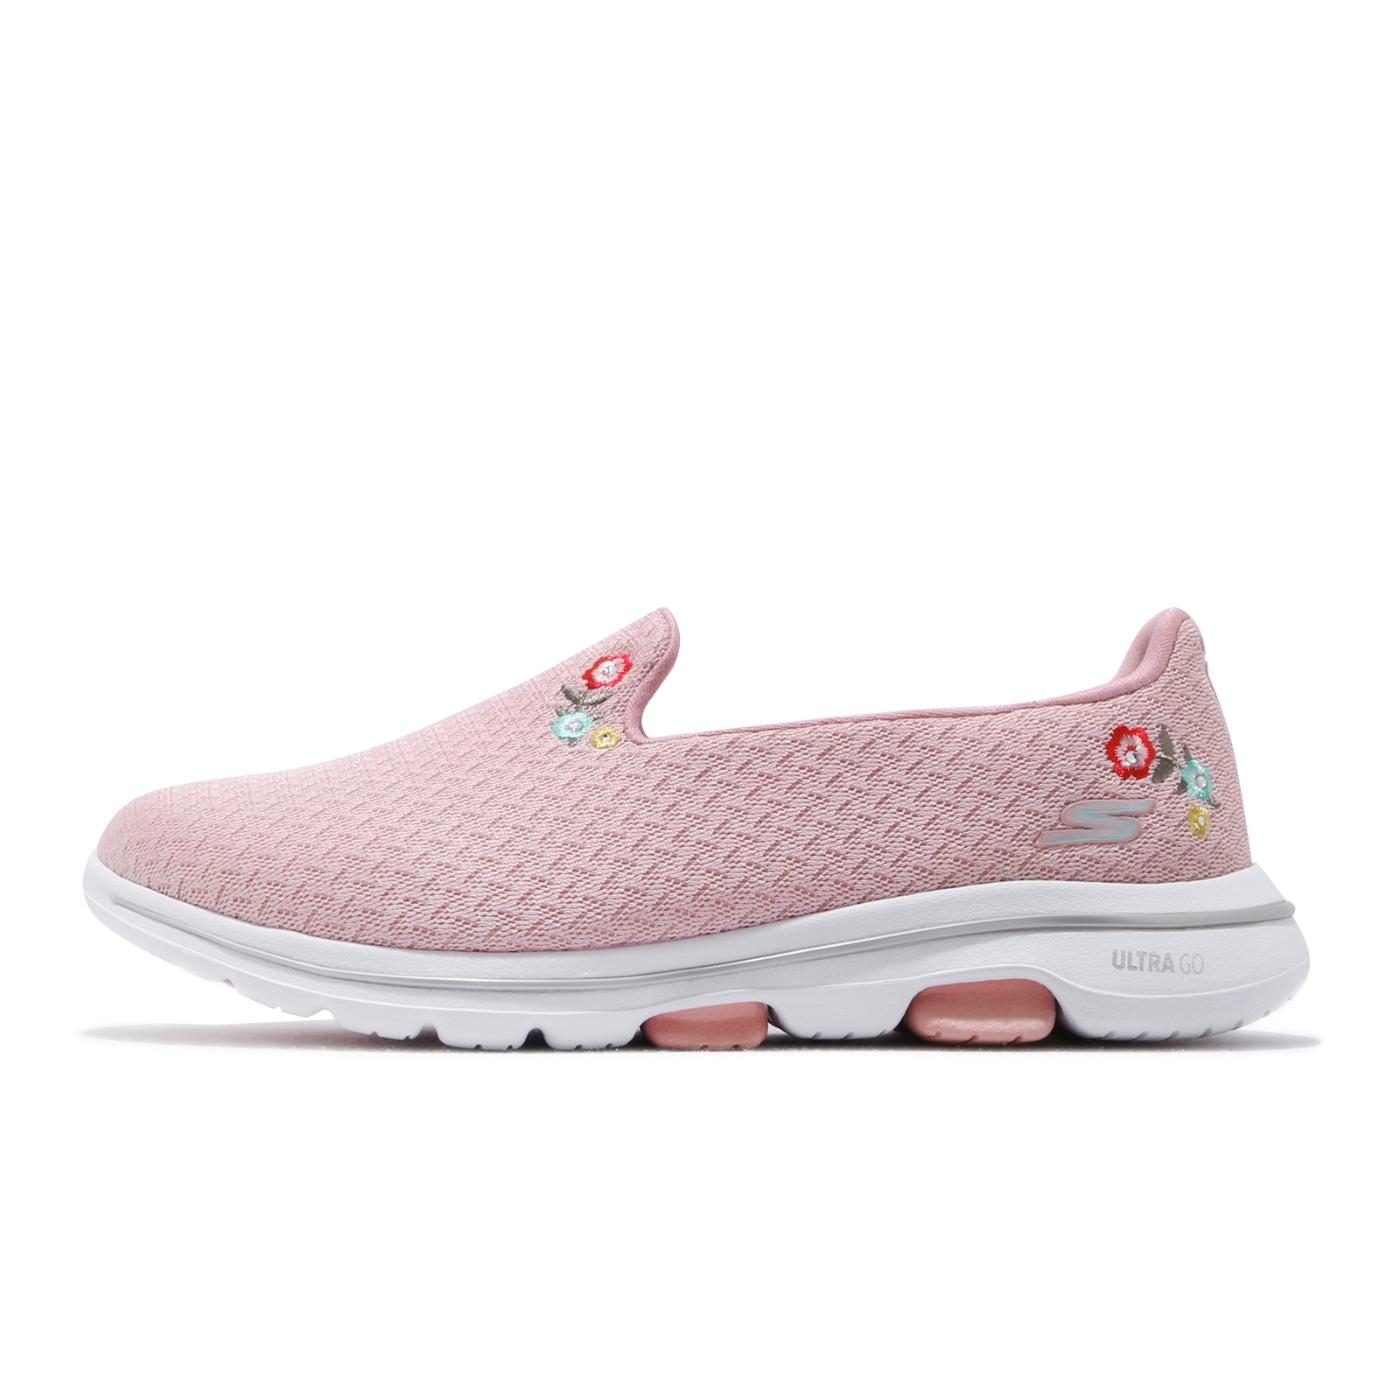 Skechers 休閒鞋 Go Walk 5 Garland 女鞋 寬楦 健走 郊遊 踏青 懶人鞋 好穿脫 粉 白 124002WPNK